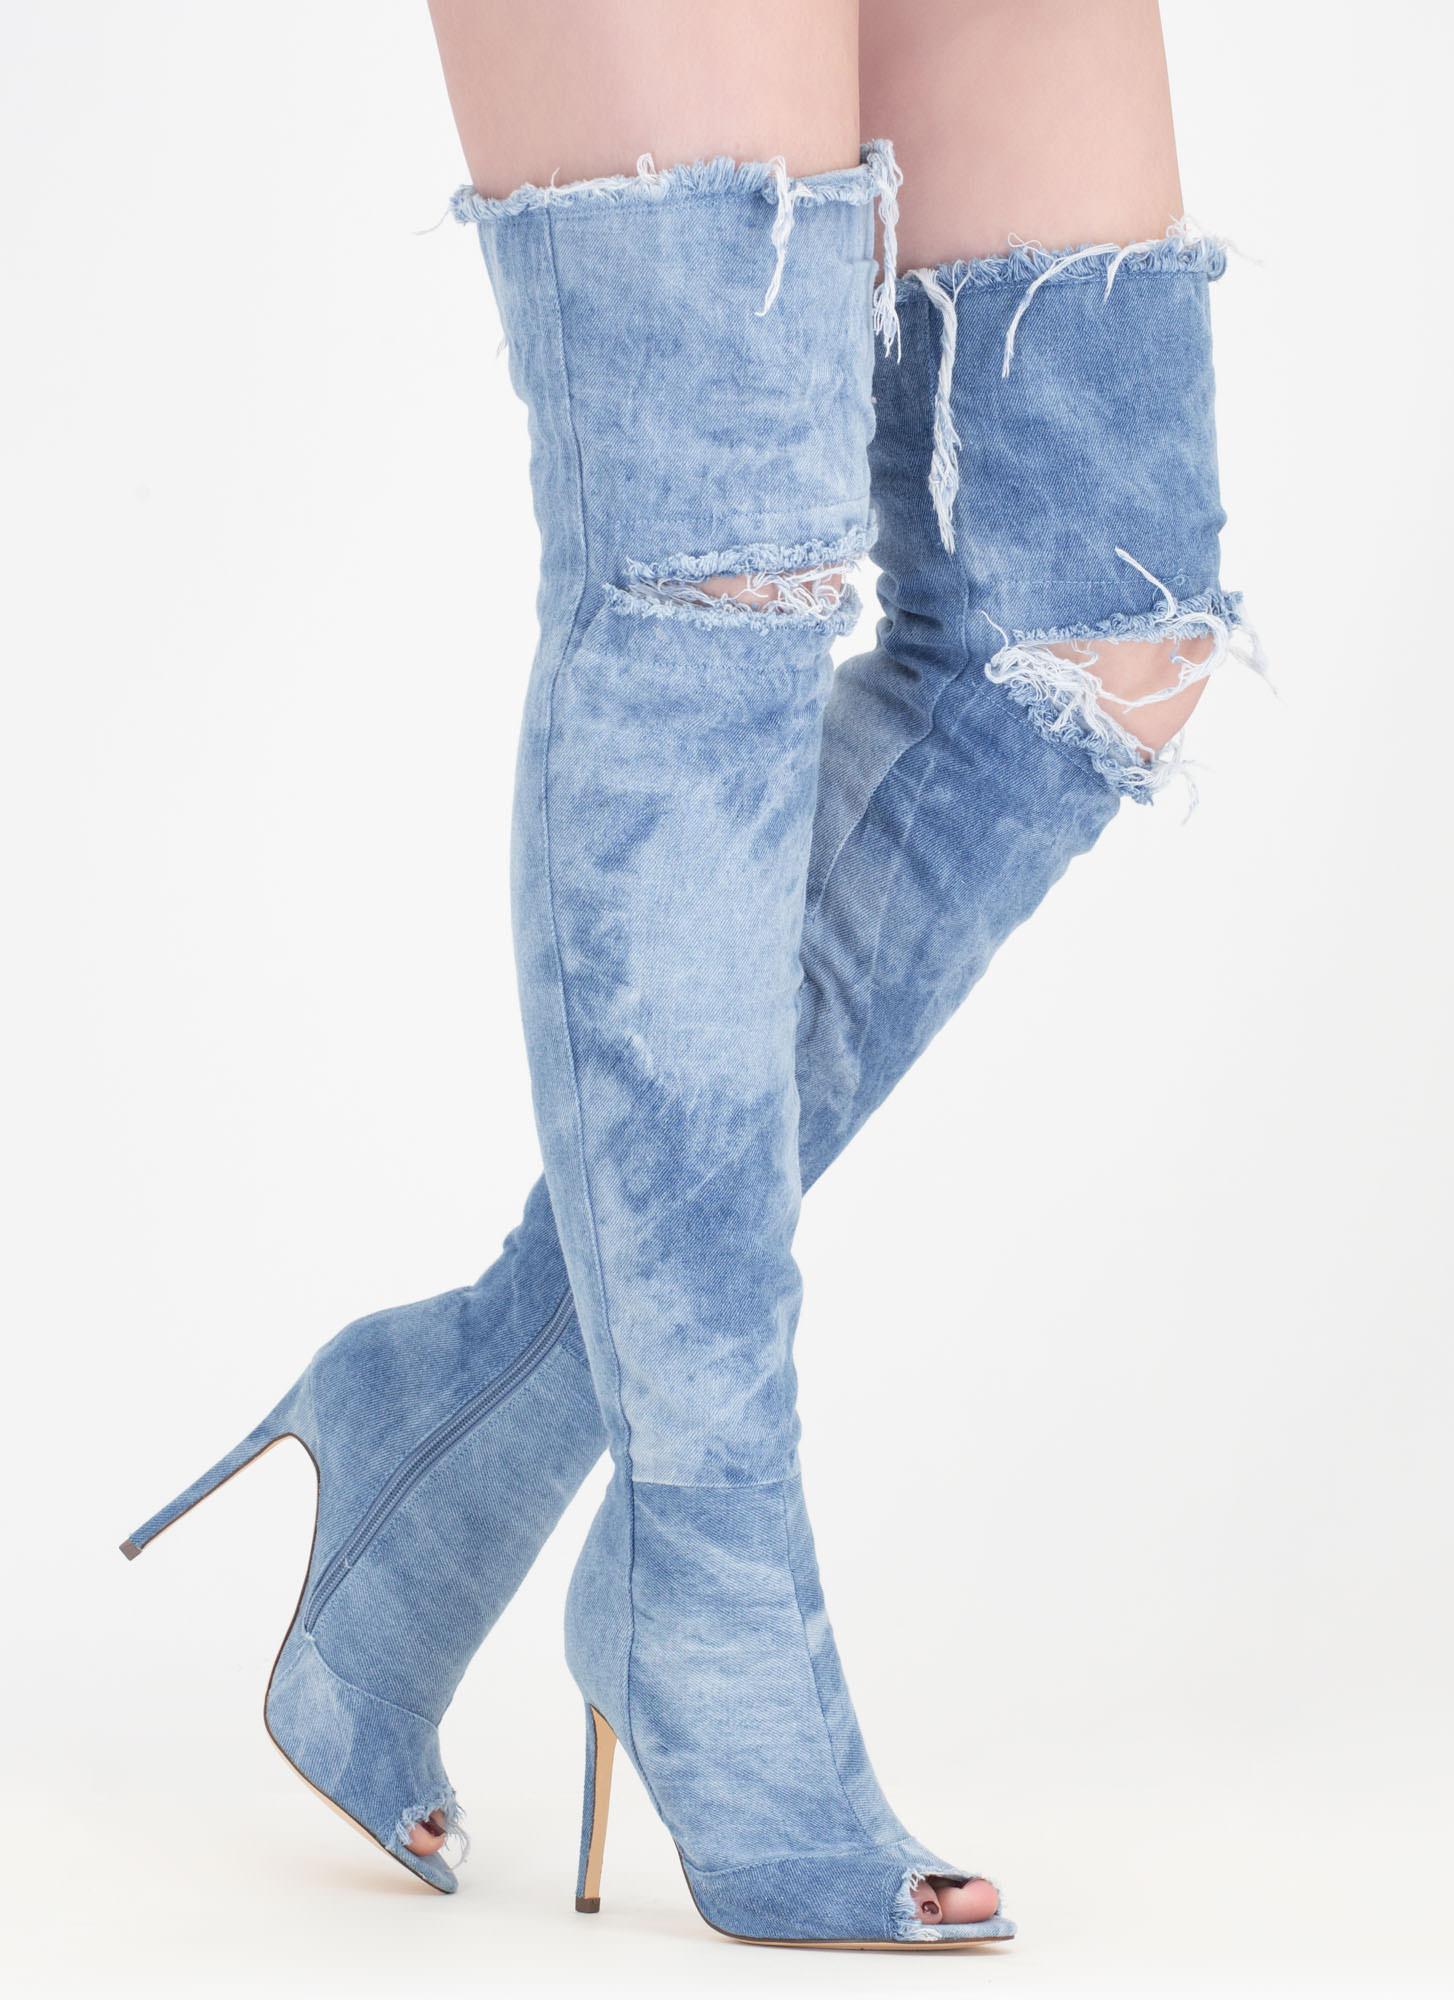 Signal Denim Thigh-High Boots GREY BLACK BLUE MEDIUMBLUE - GoJane.com